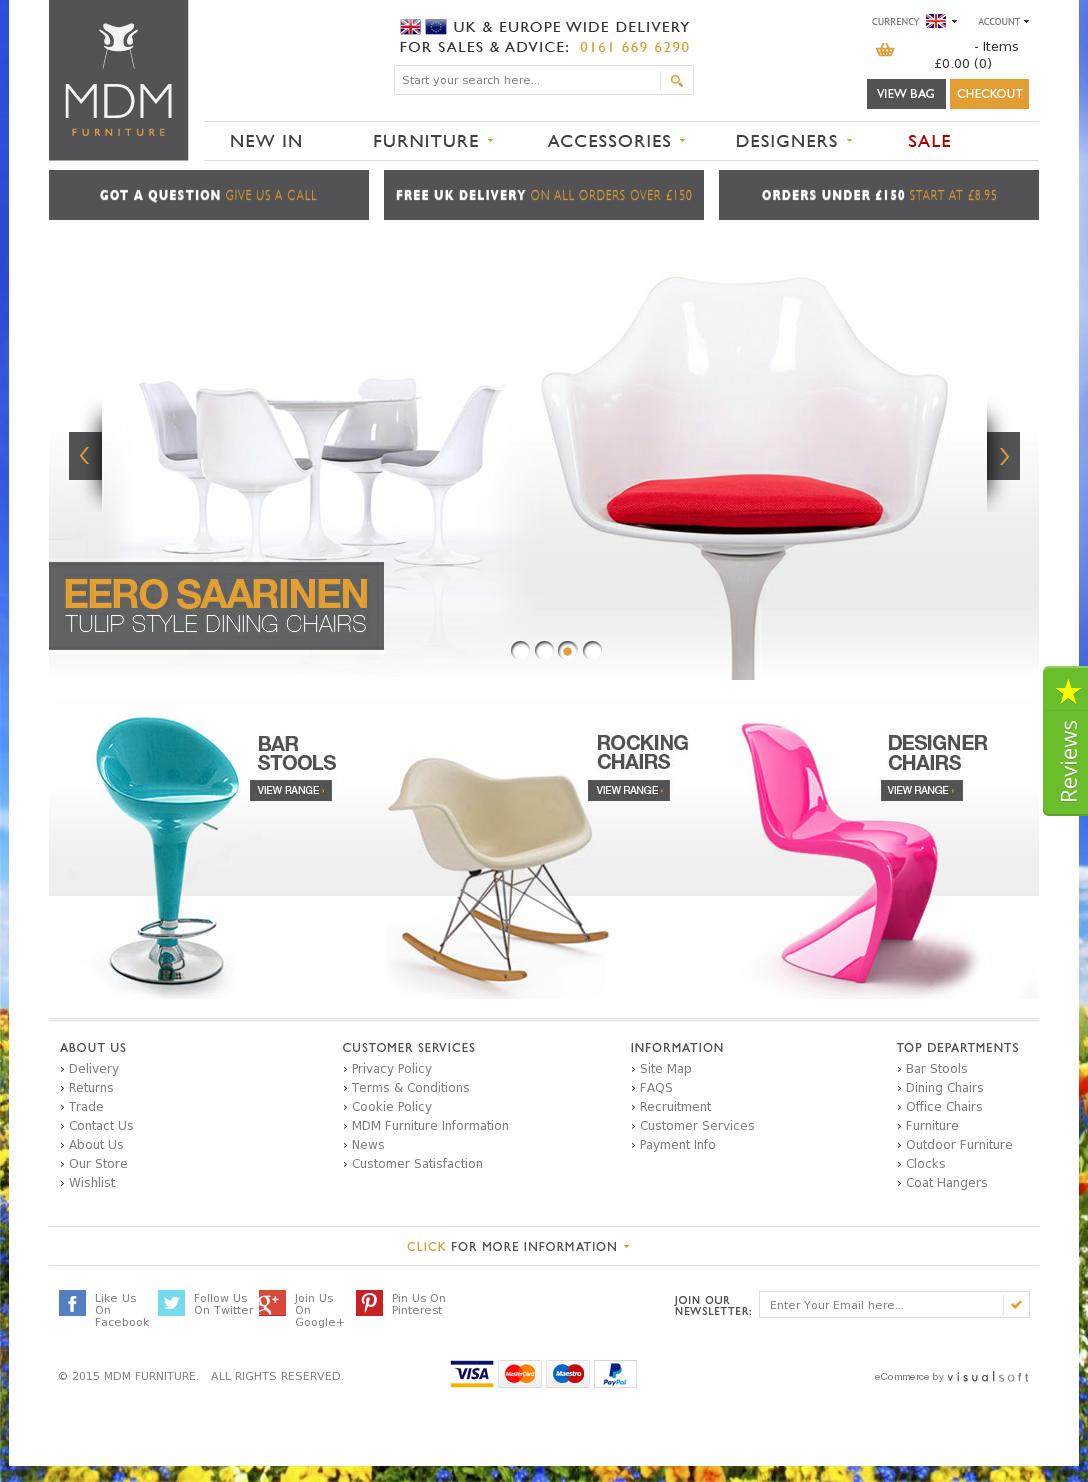 Mdm Furniture Website History